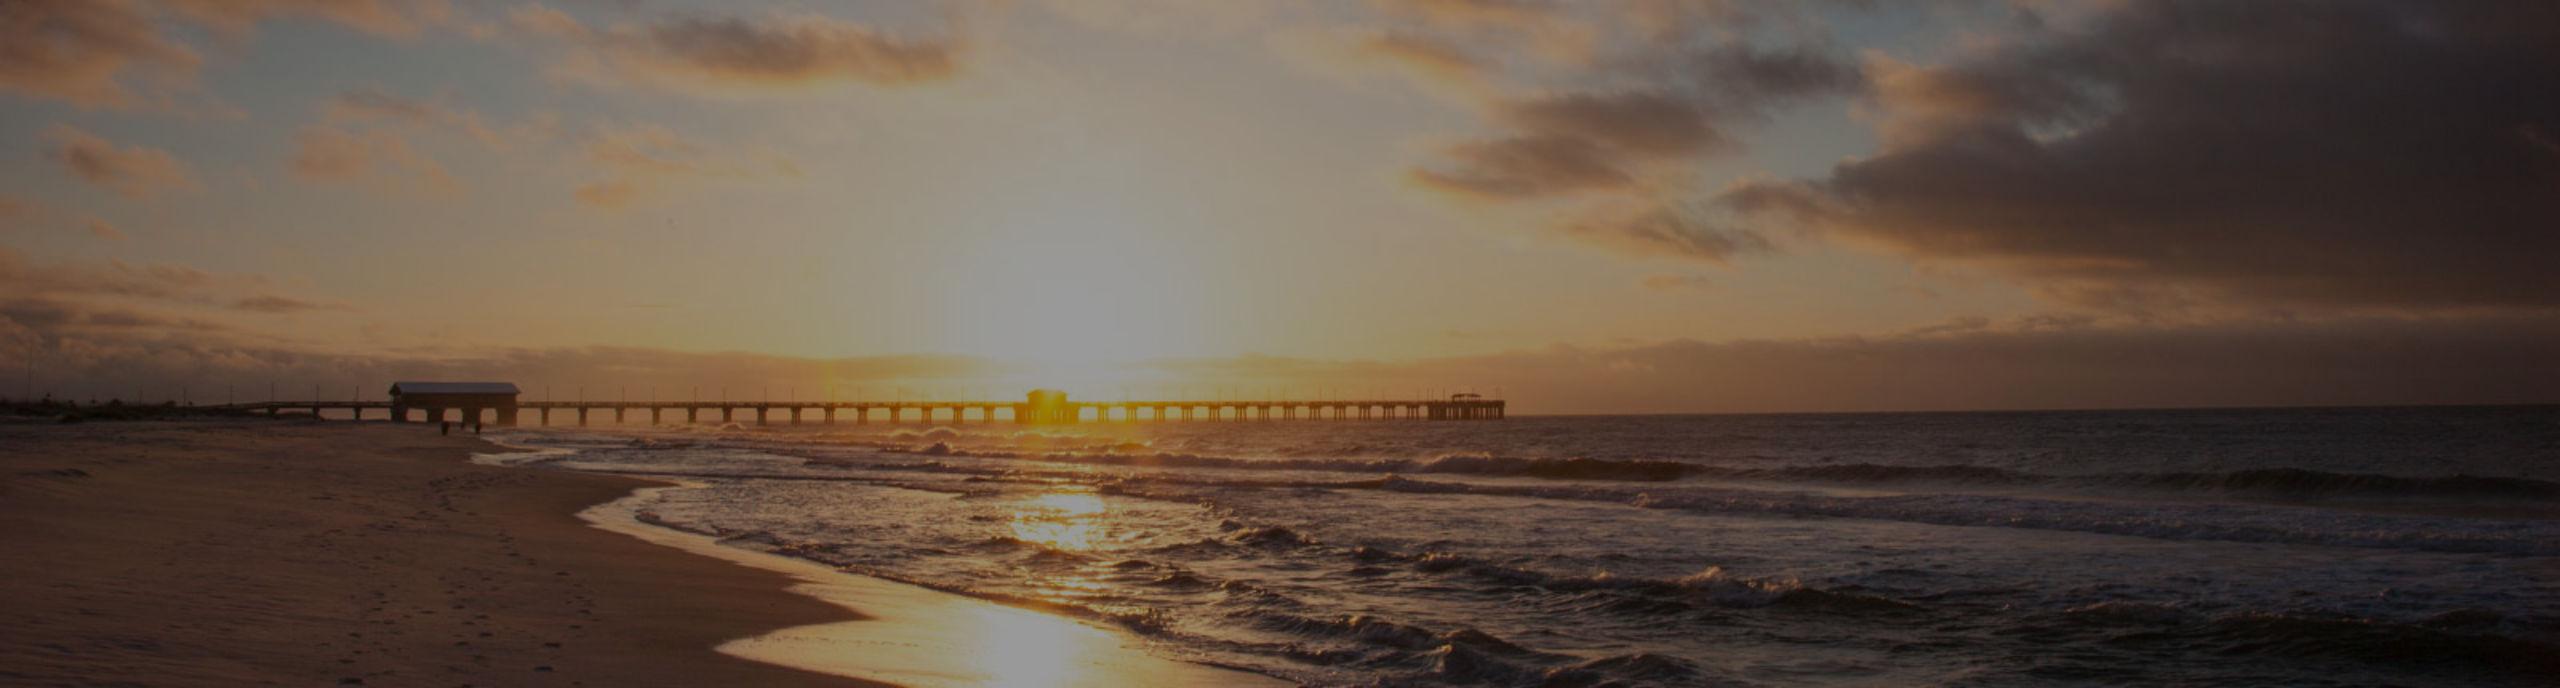 Average Temperatures for Gulf Shores and Orange Beach